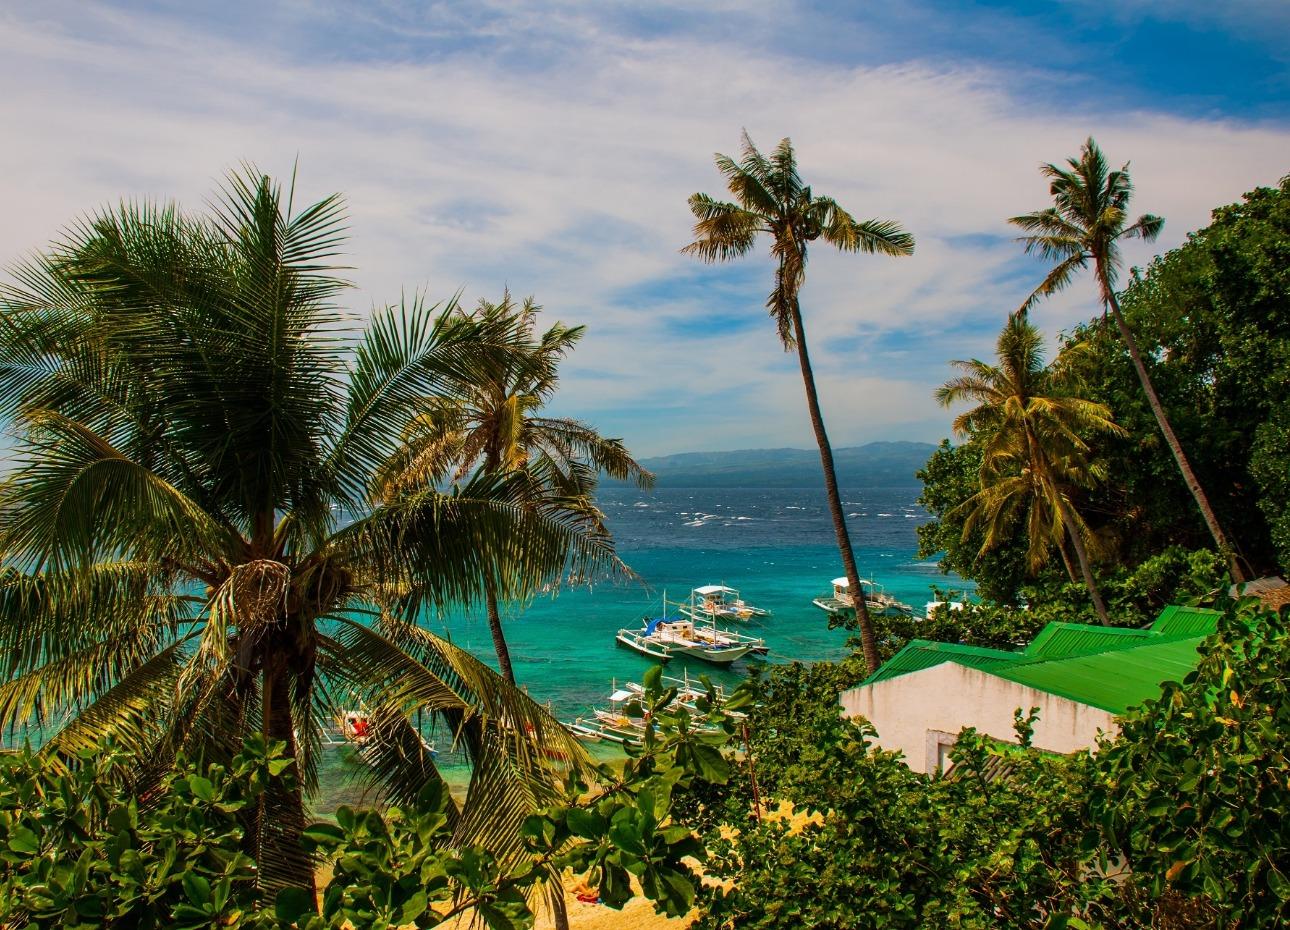 Philippines, Resort, Palm trees, image,